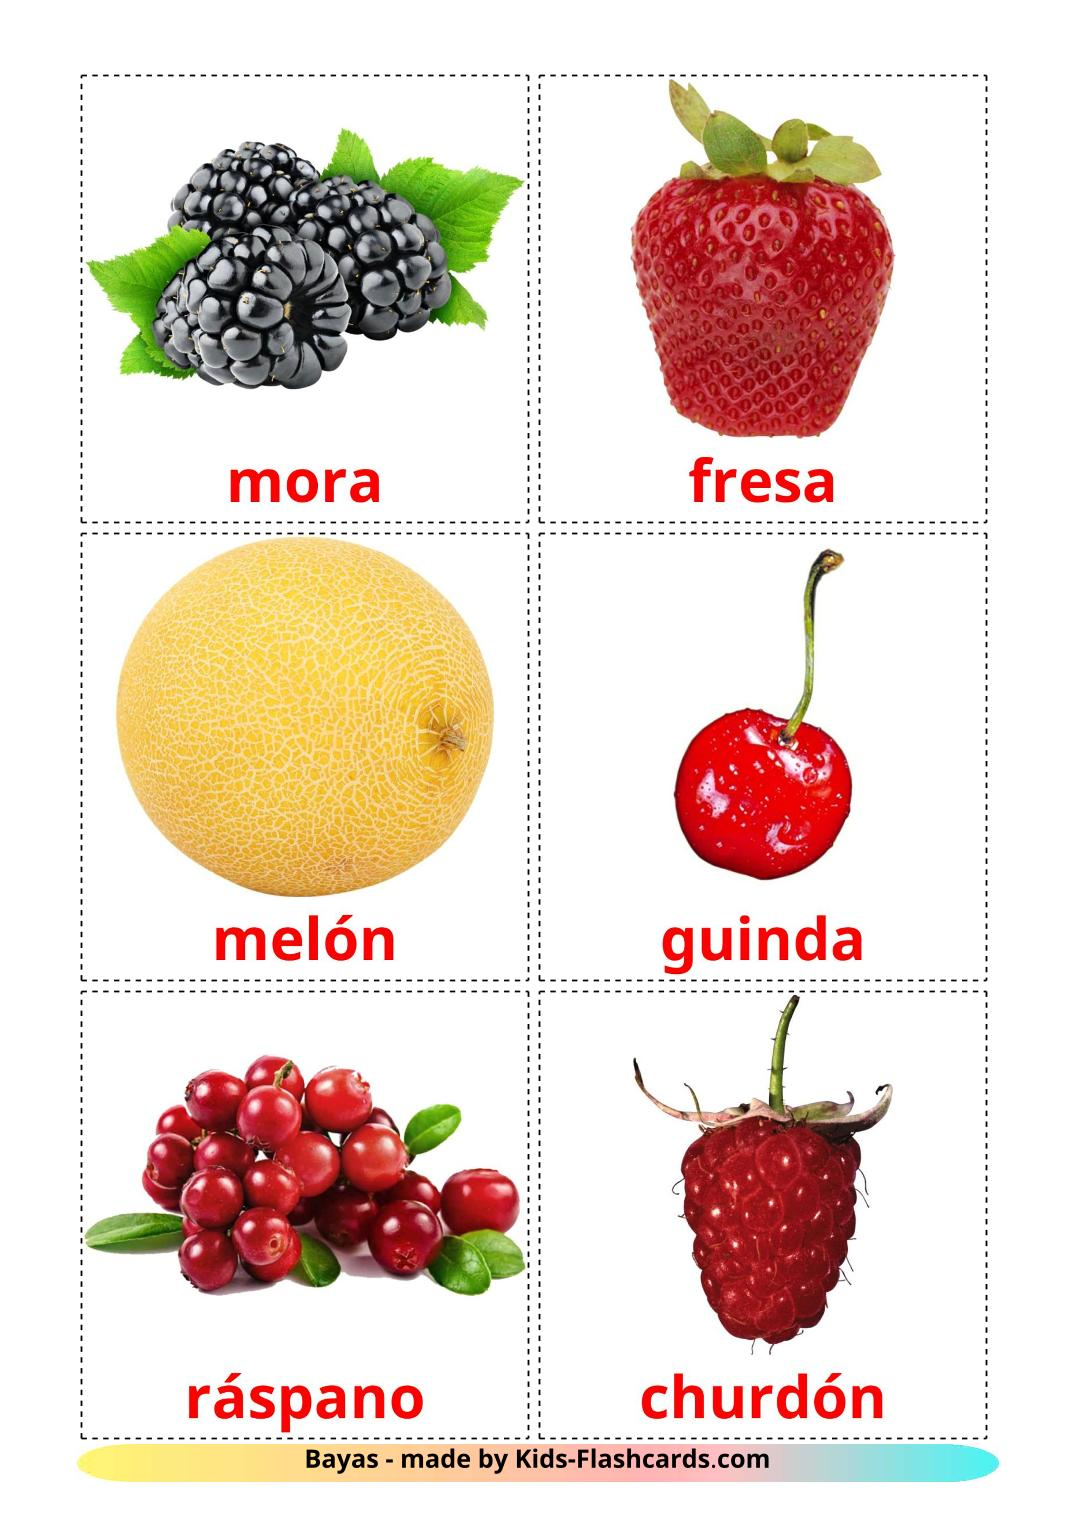 Berries - 11 Free Printable spanish Flashcards